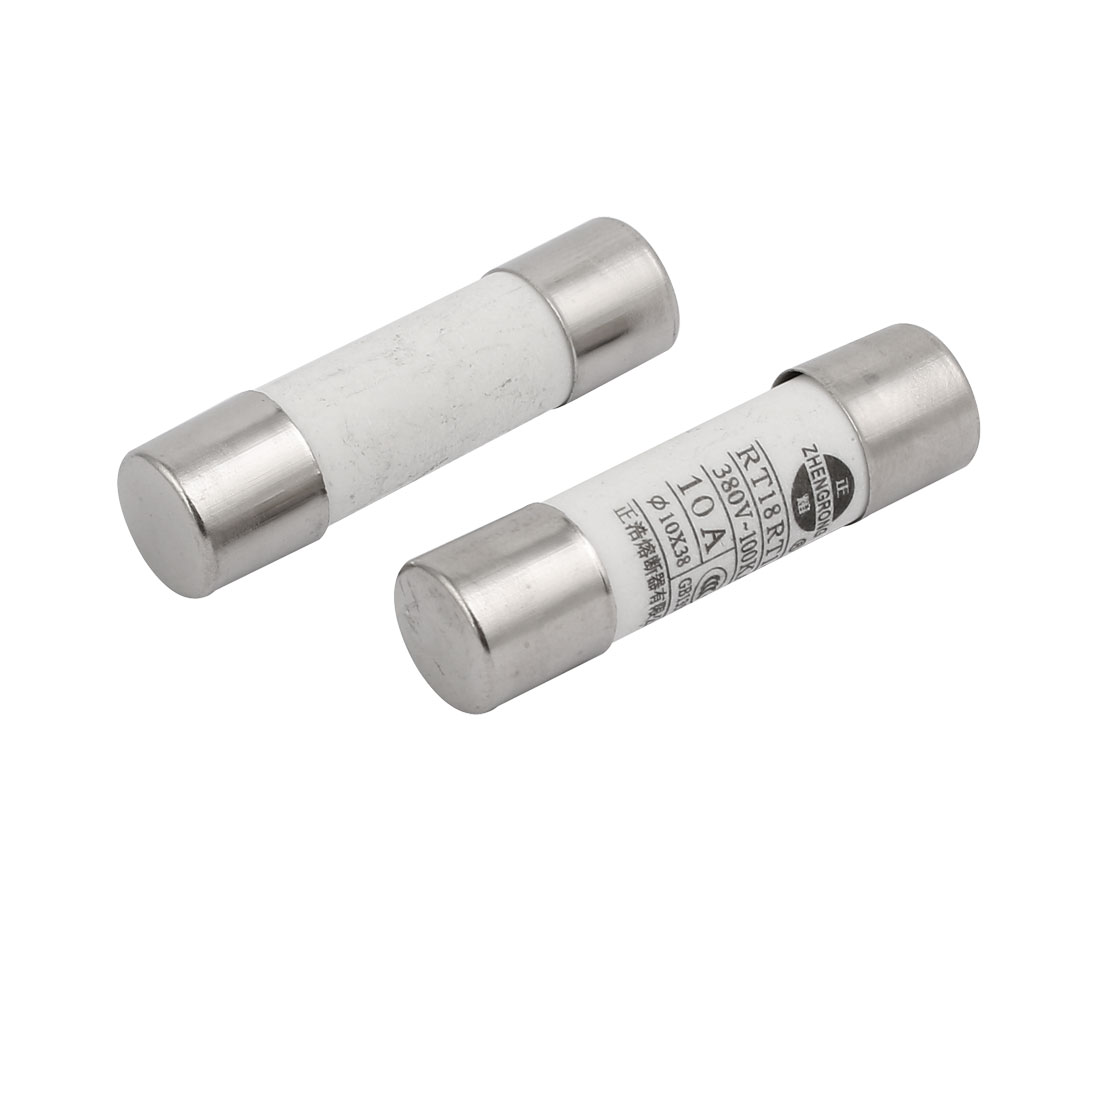 2pcs AC 380V 10A RT18 10x37mm Fast Blow Cylindrical Ceramic Tube Fuses